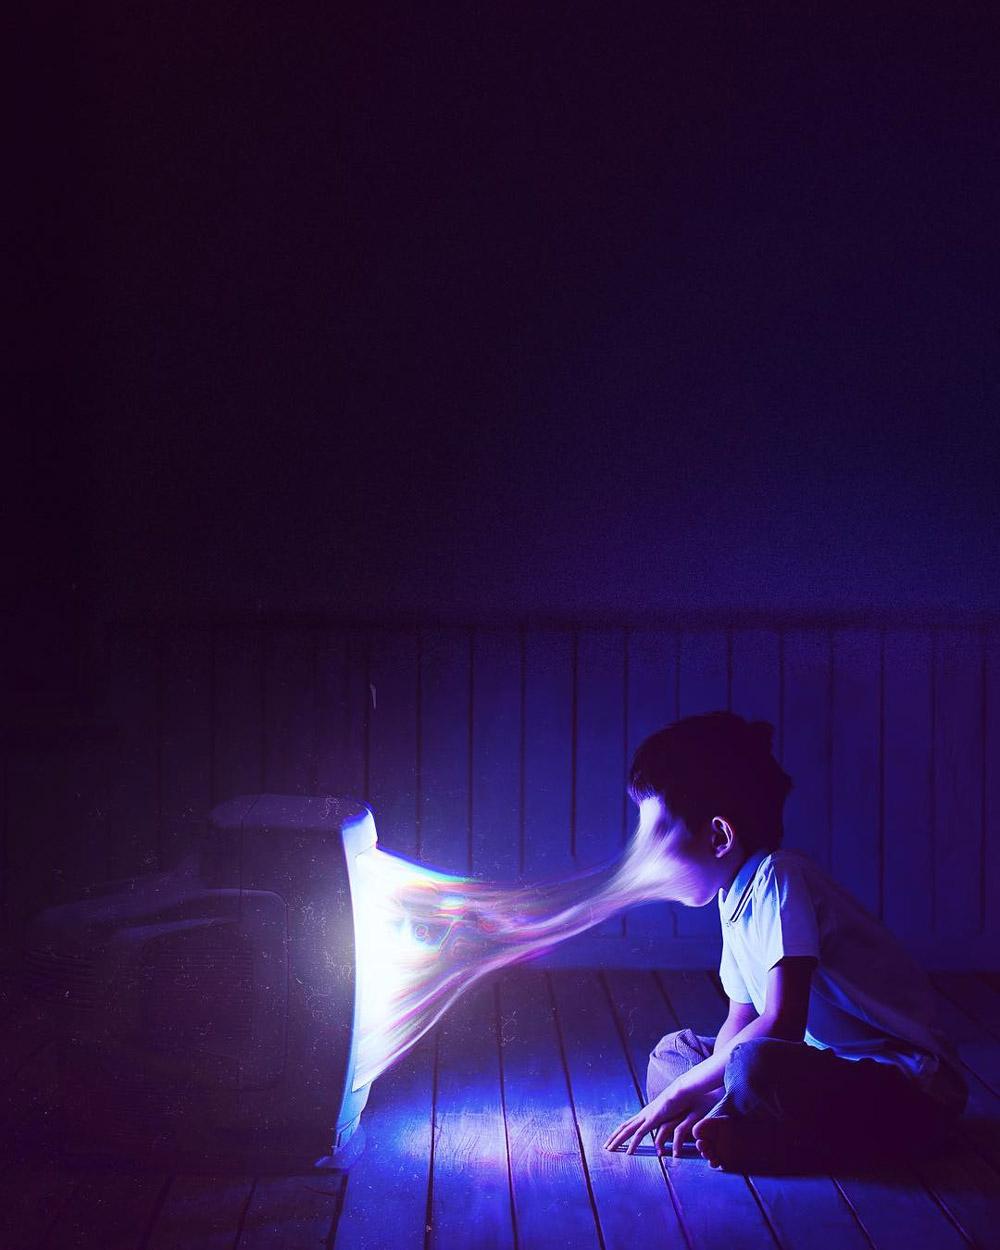 Slimesunday-Interview-Visual-Atelier-8-Art-24.jpg